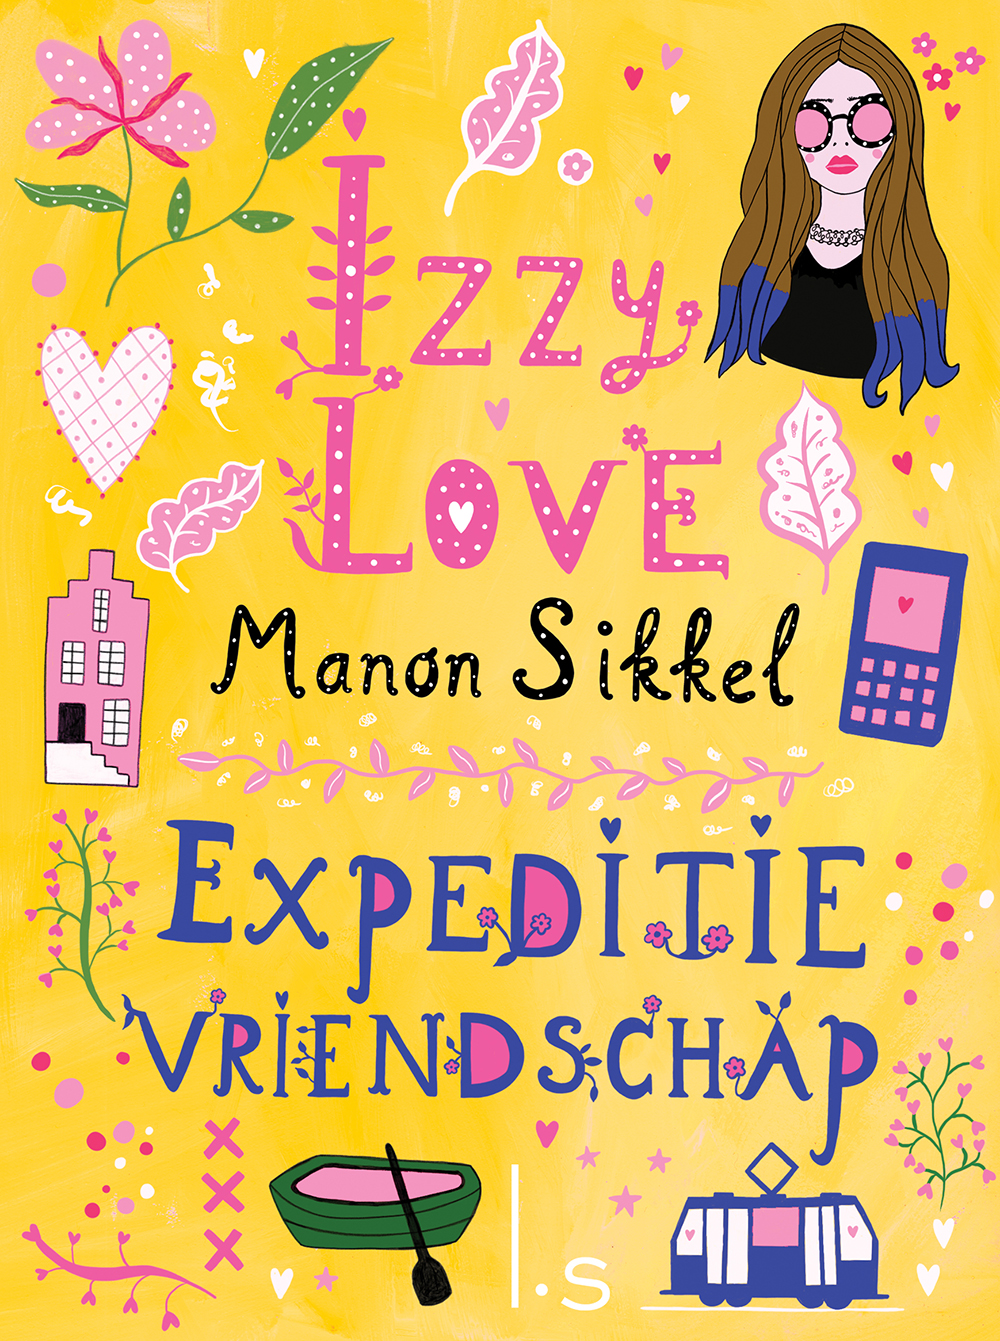 Izzy Love, design and illustration by Marenthe.jpg